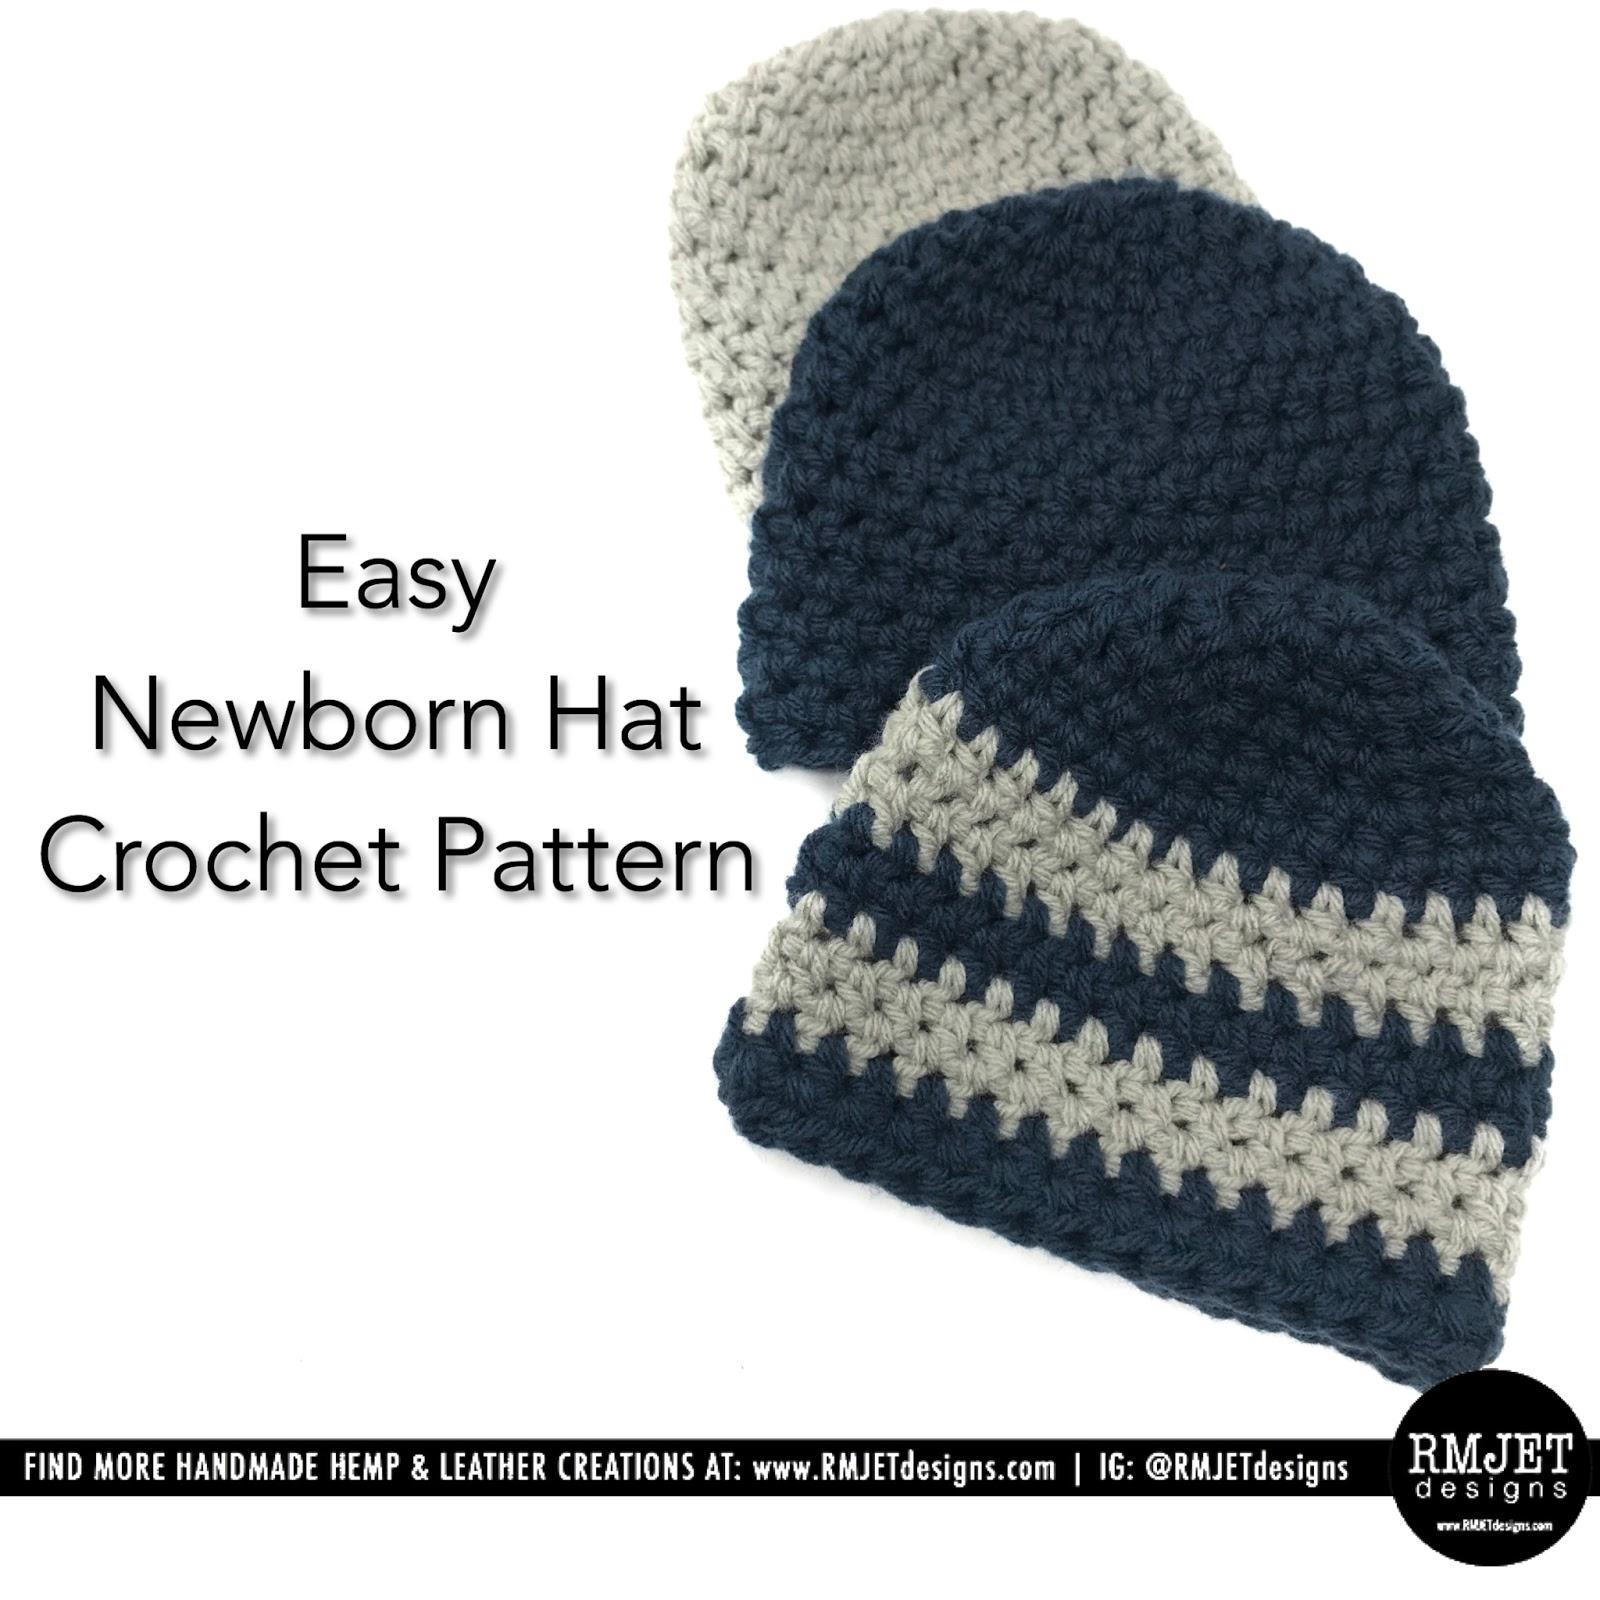 FREE Newborn Baby Hat Crochet Pattern by RMJETdesigns